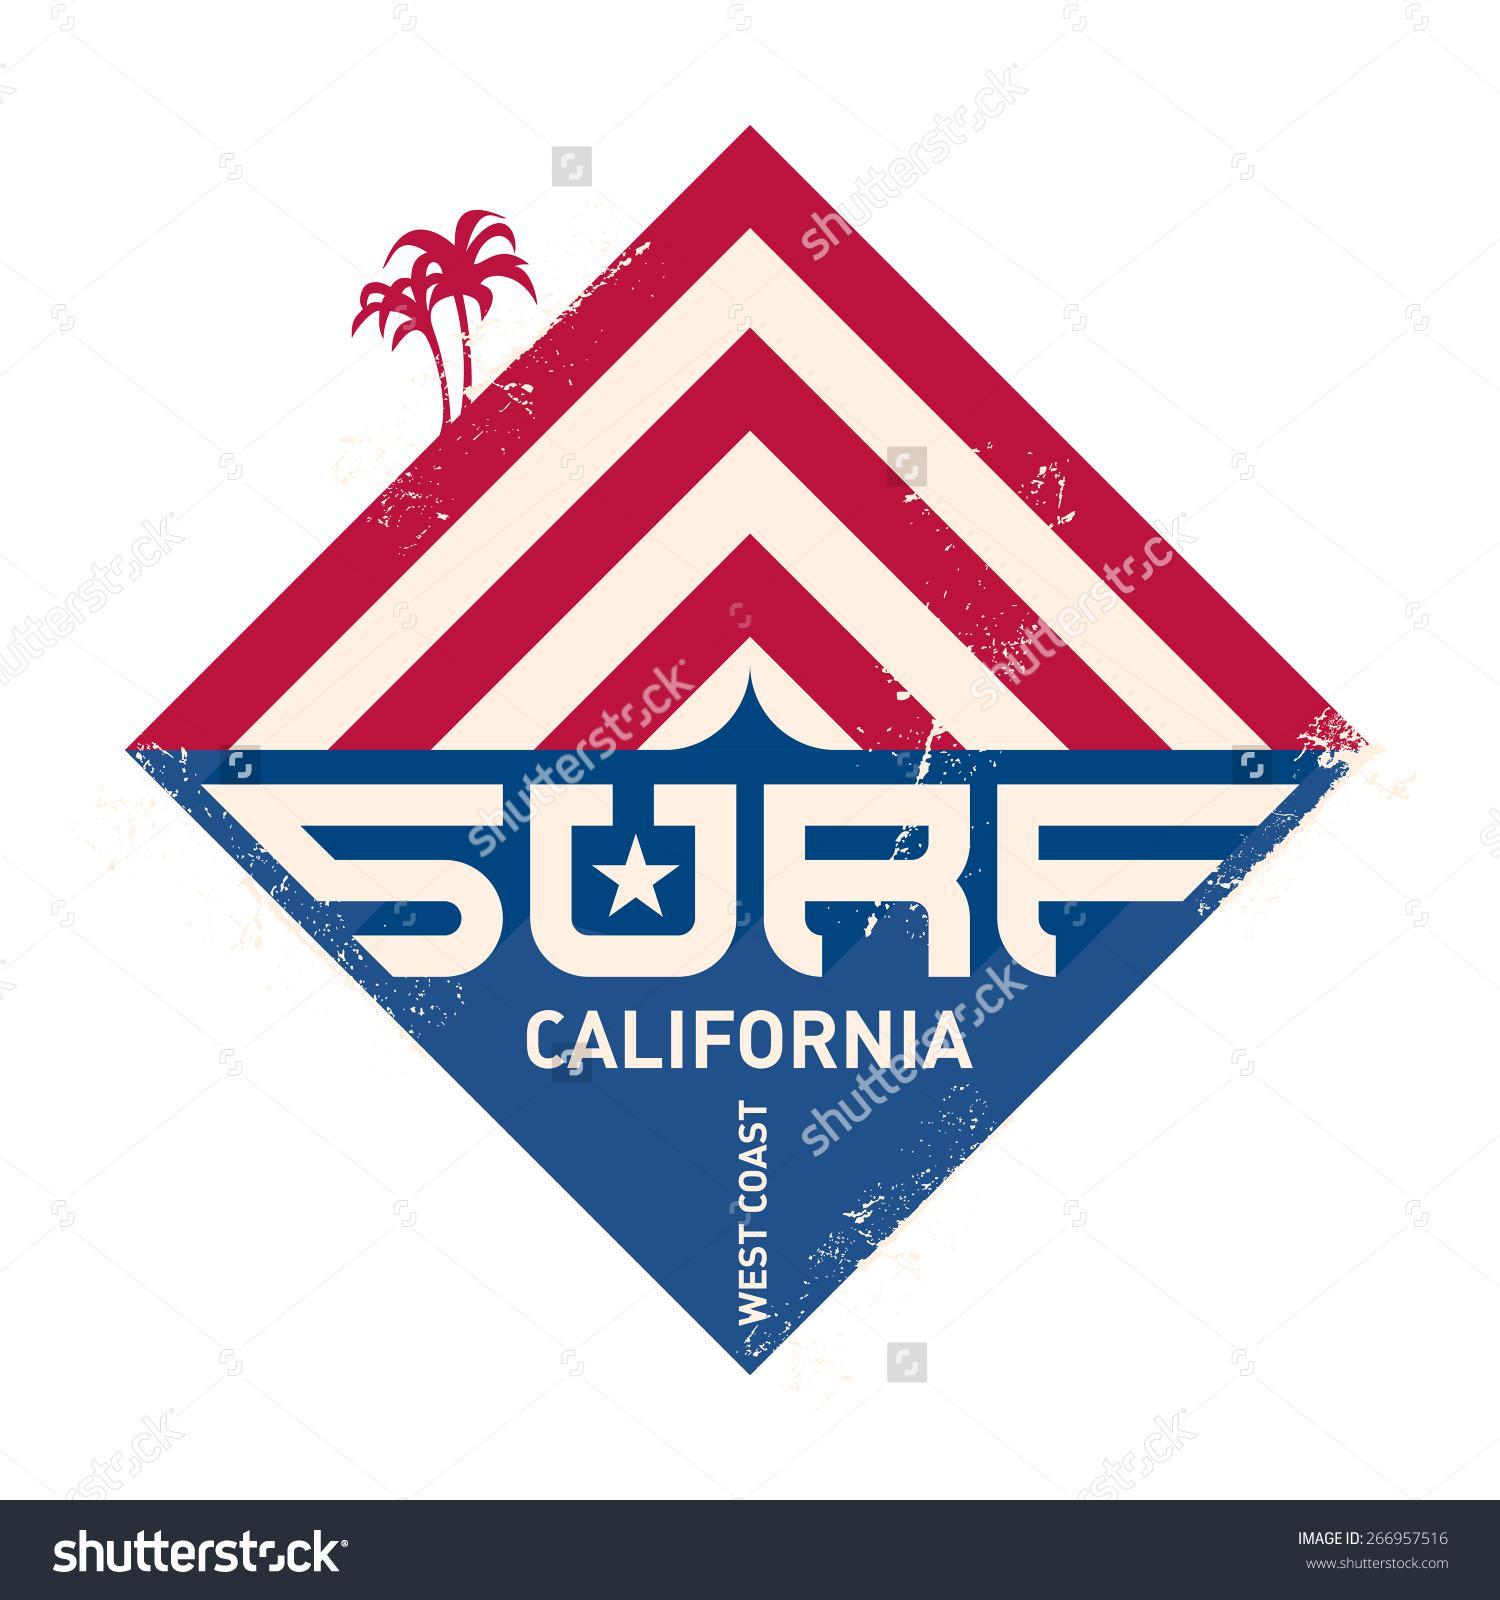 Pacific ocean logo clipart.